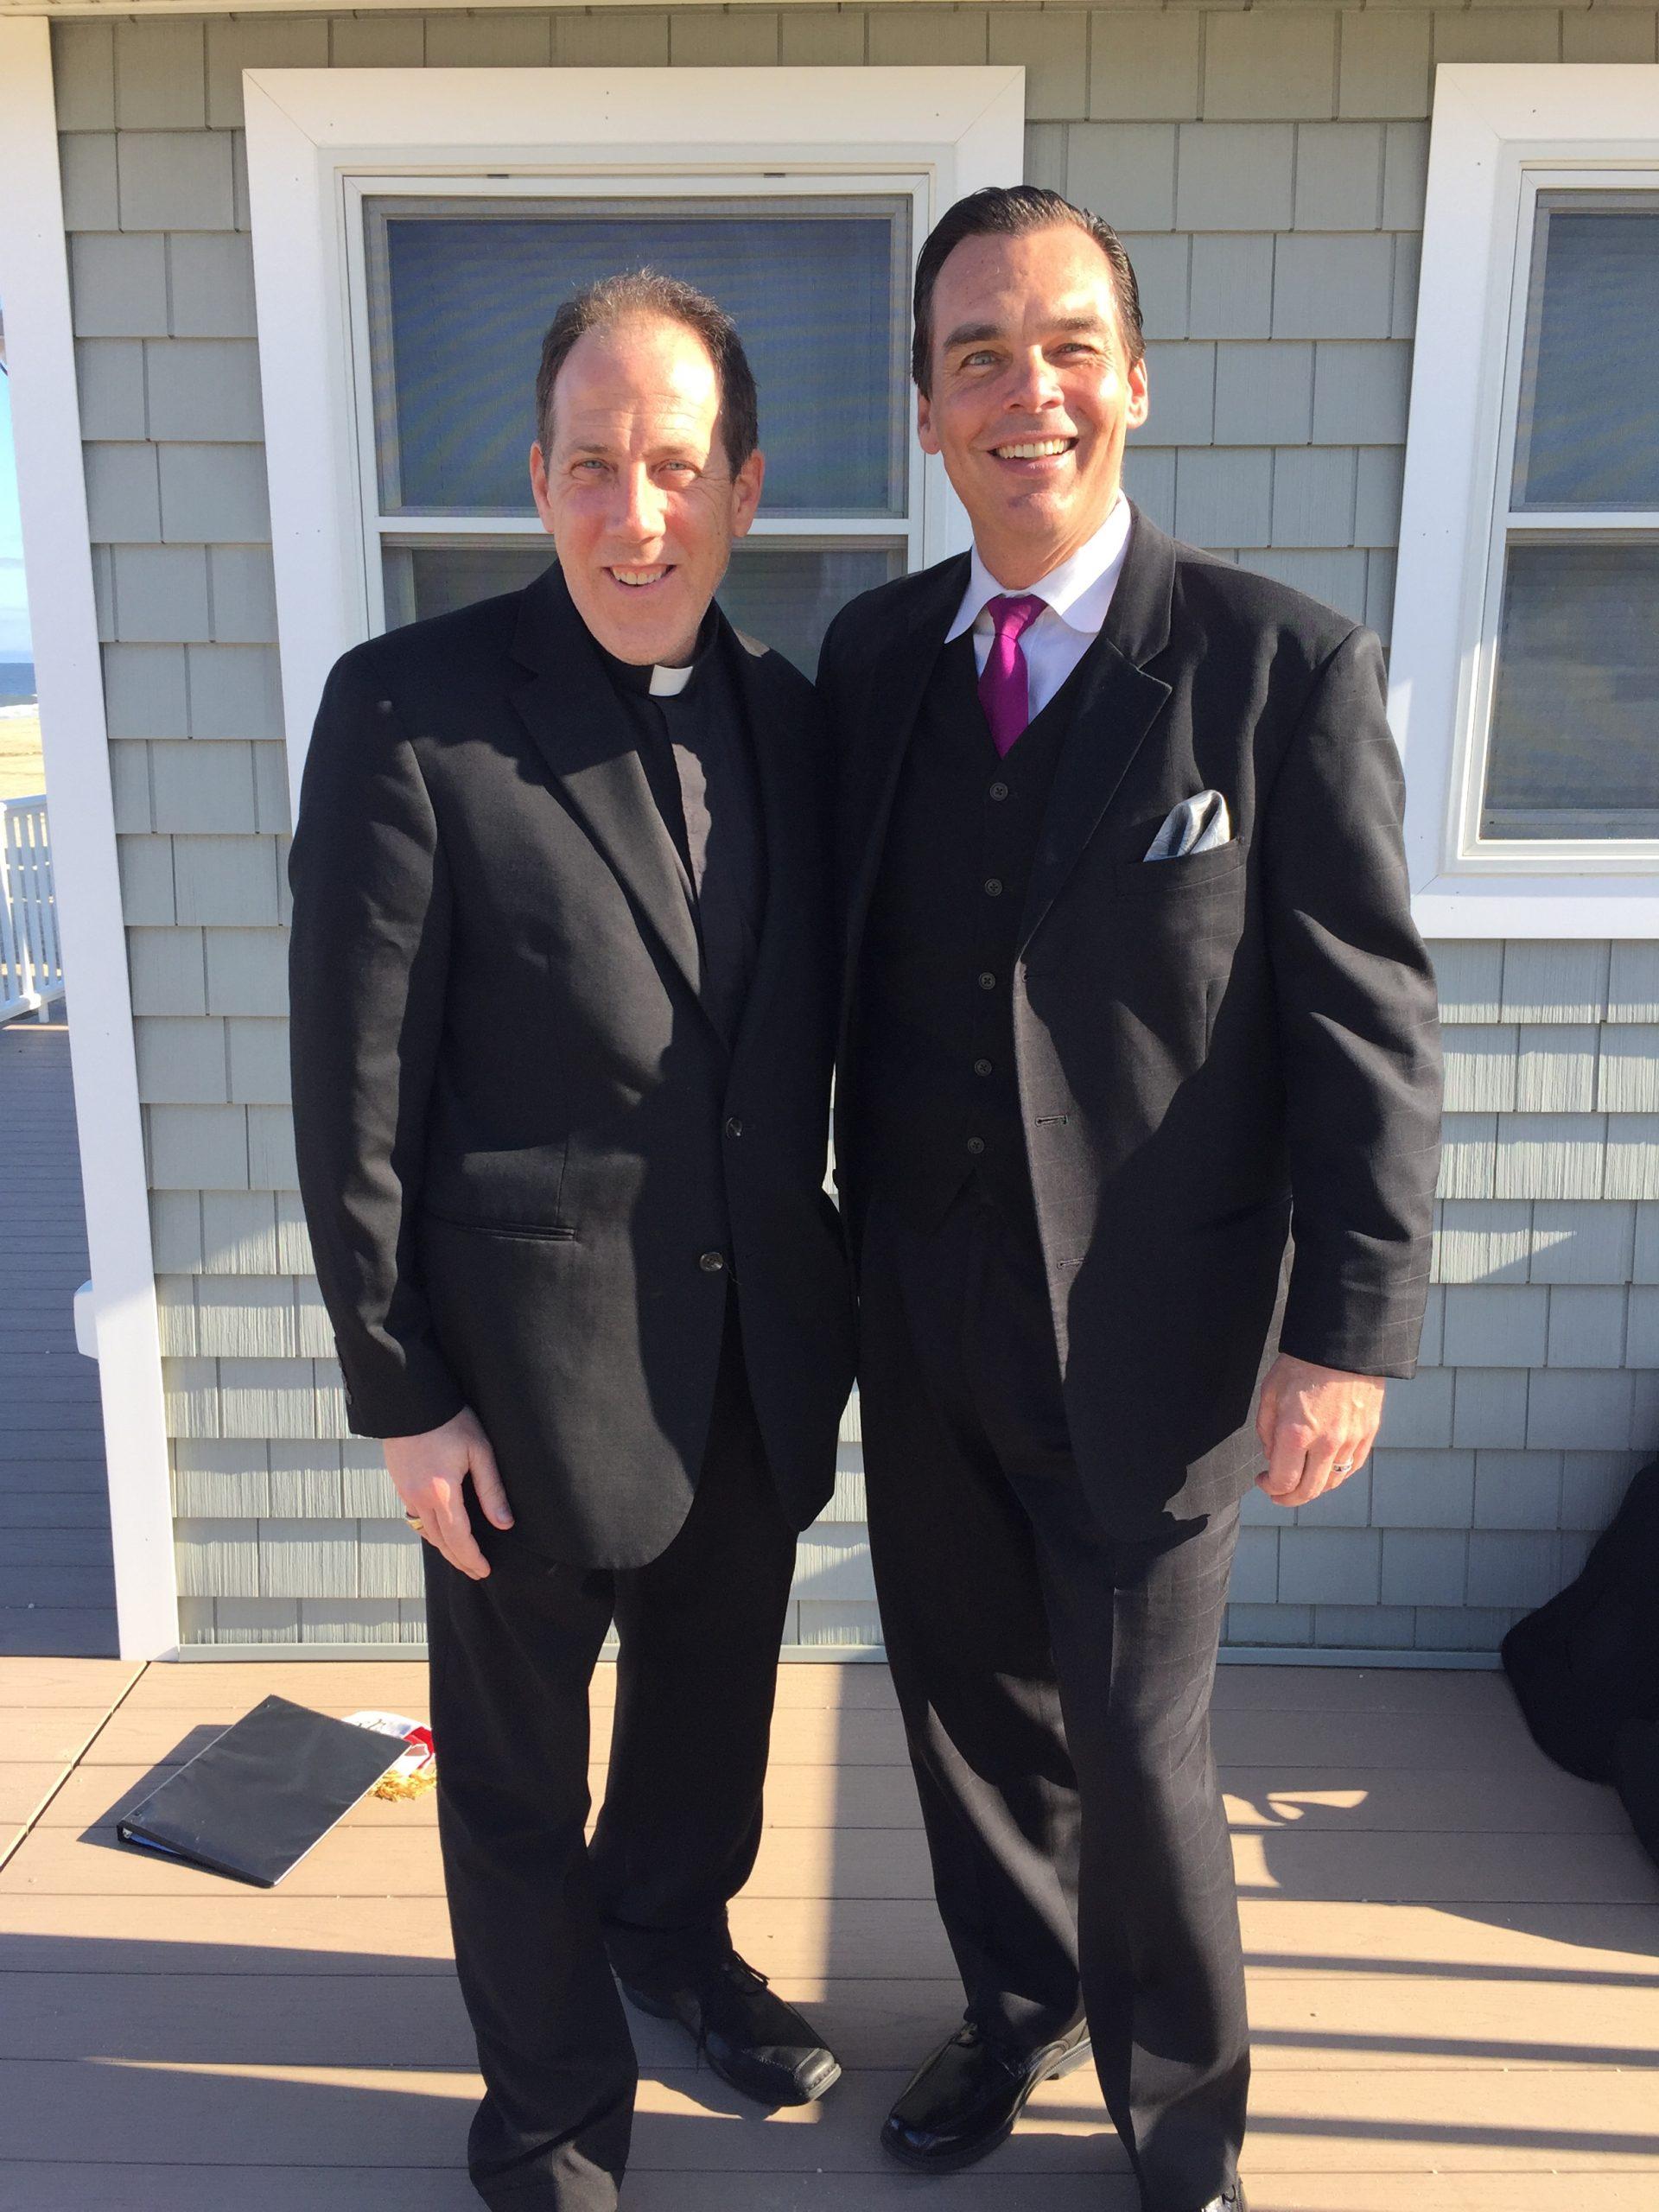 Father Jphn Michael O'Sullivan and I before the ceremony